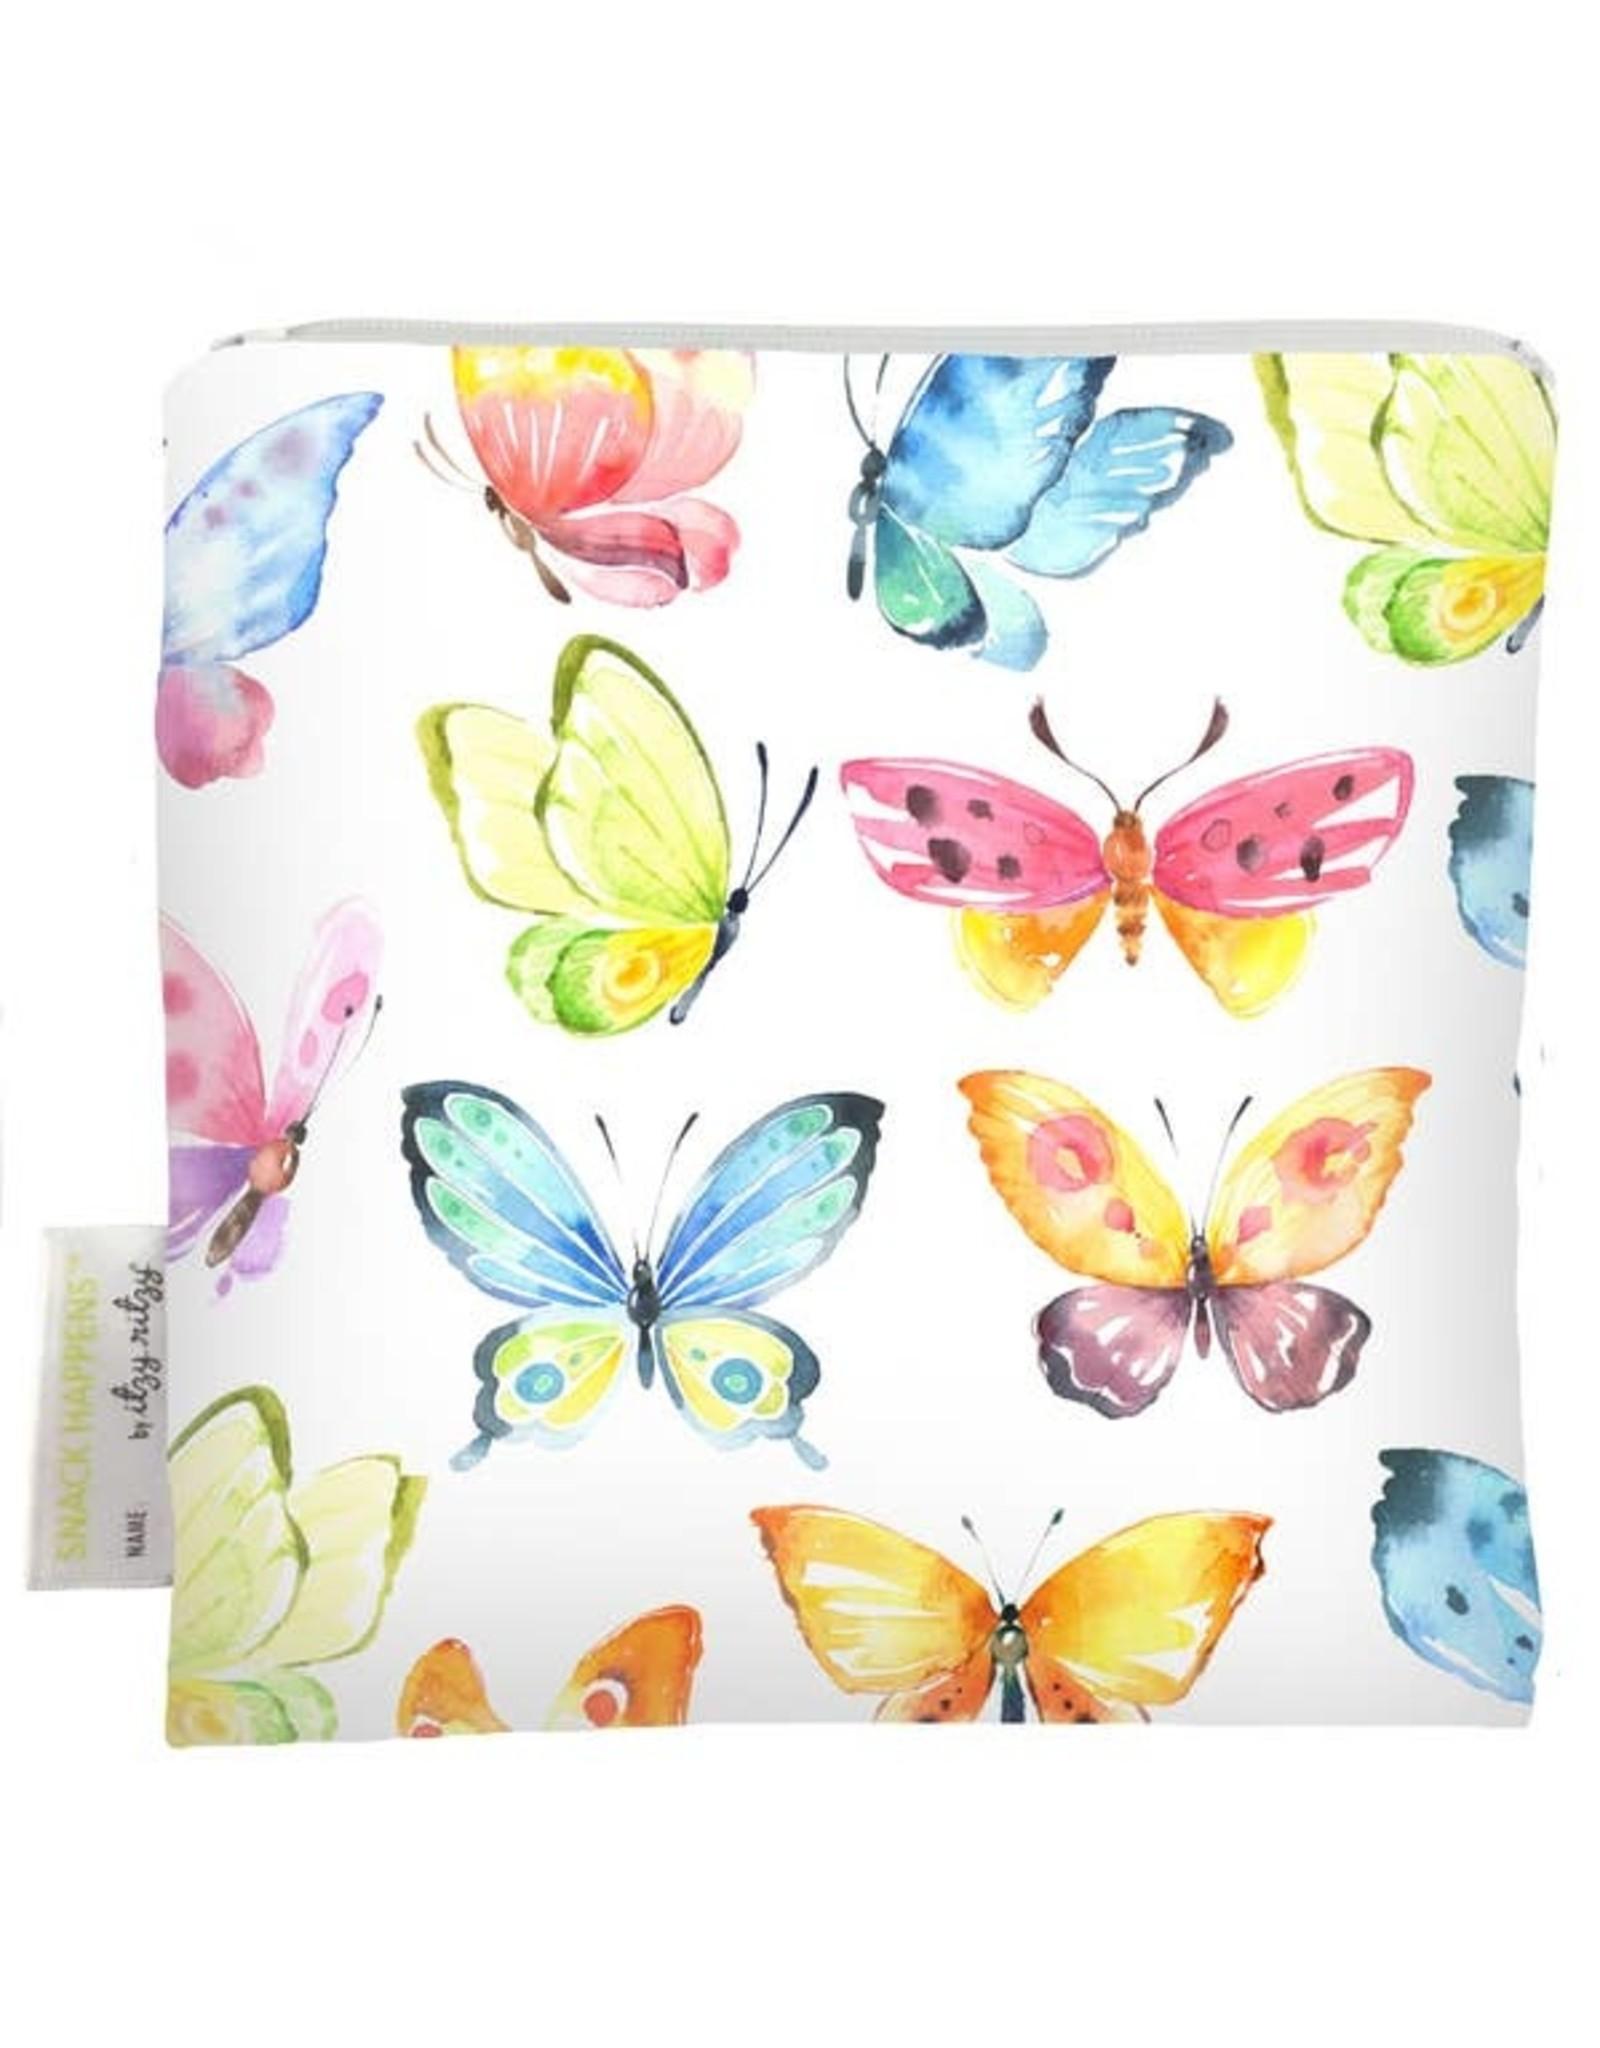 Itzy Ritzy Reusable Snack Bag, Beautiful Butterflies